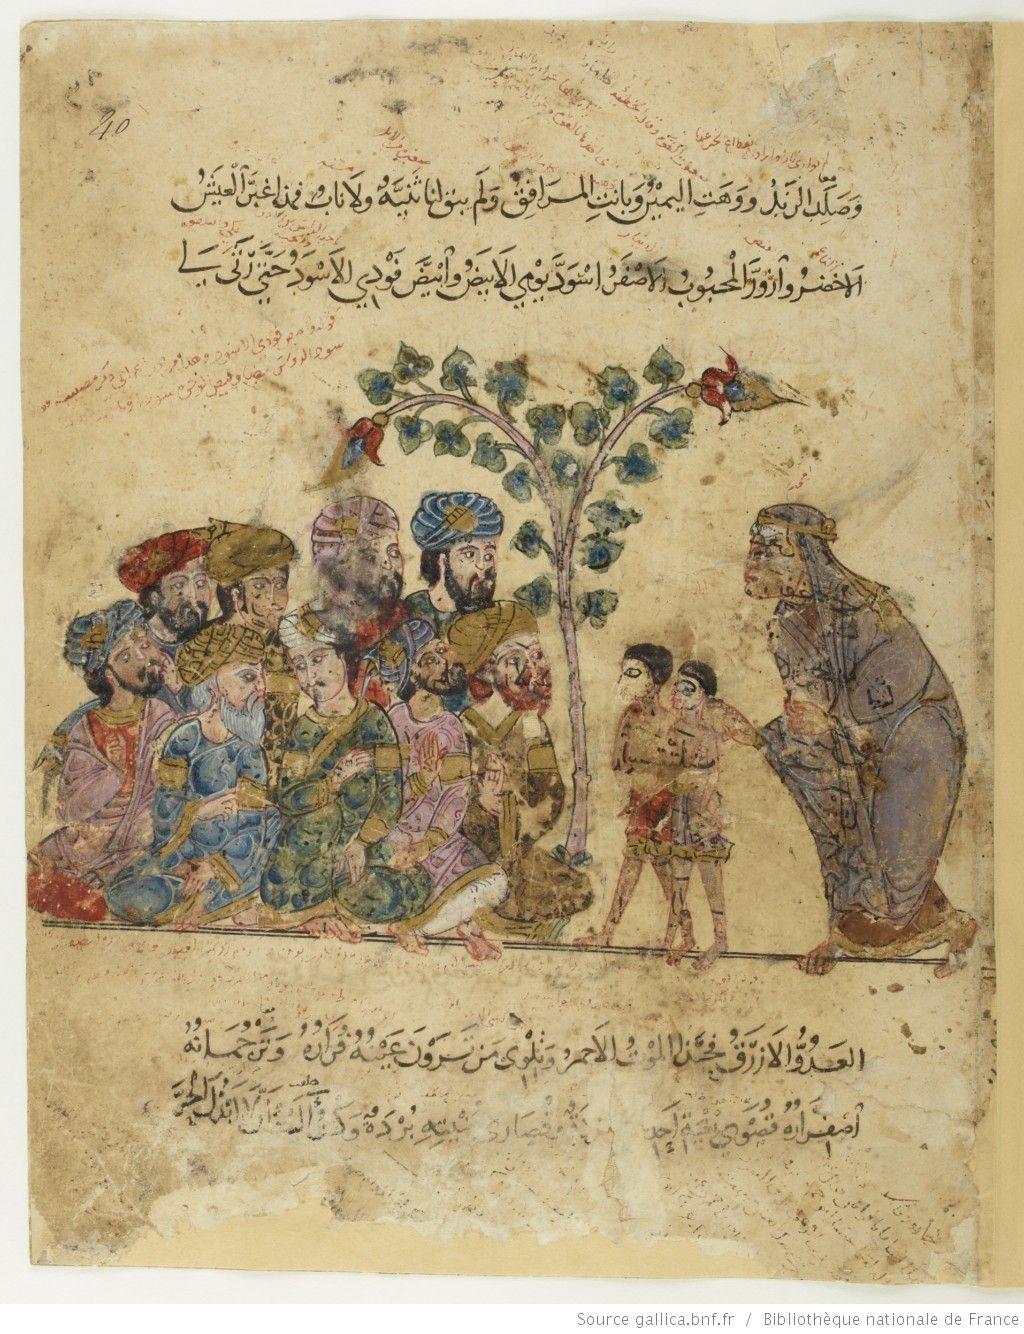 Maqamat of al-Hariri Bibliothèque nationale de France, manuscript Arabe 6094, dated 619H, 1222-23AD: folio 40r, Abu Zayd disguised as an old woman and al-Harith